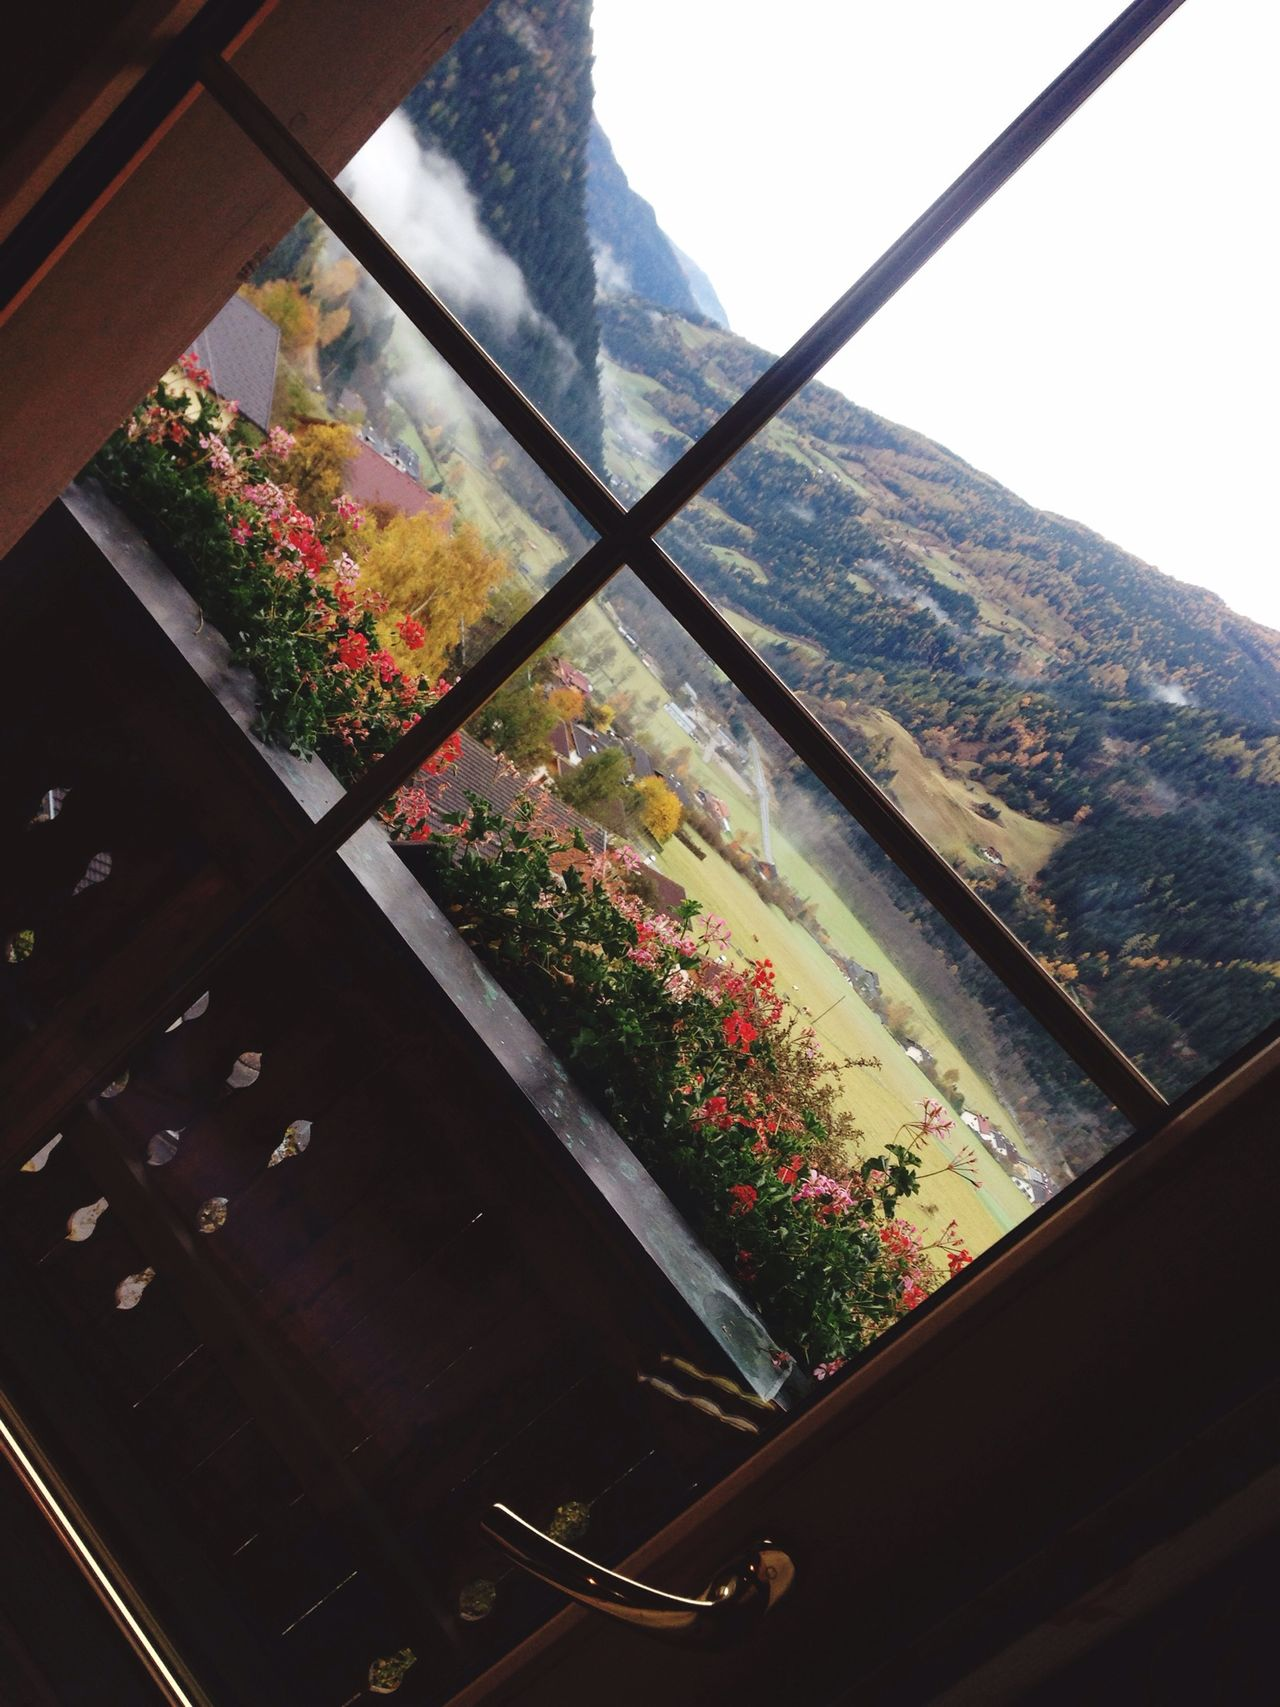 Nice Atmosphere Beautiful Surroundings Relaxing Resting Flower Window Door